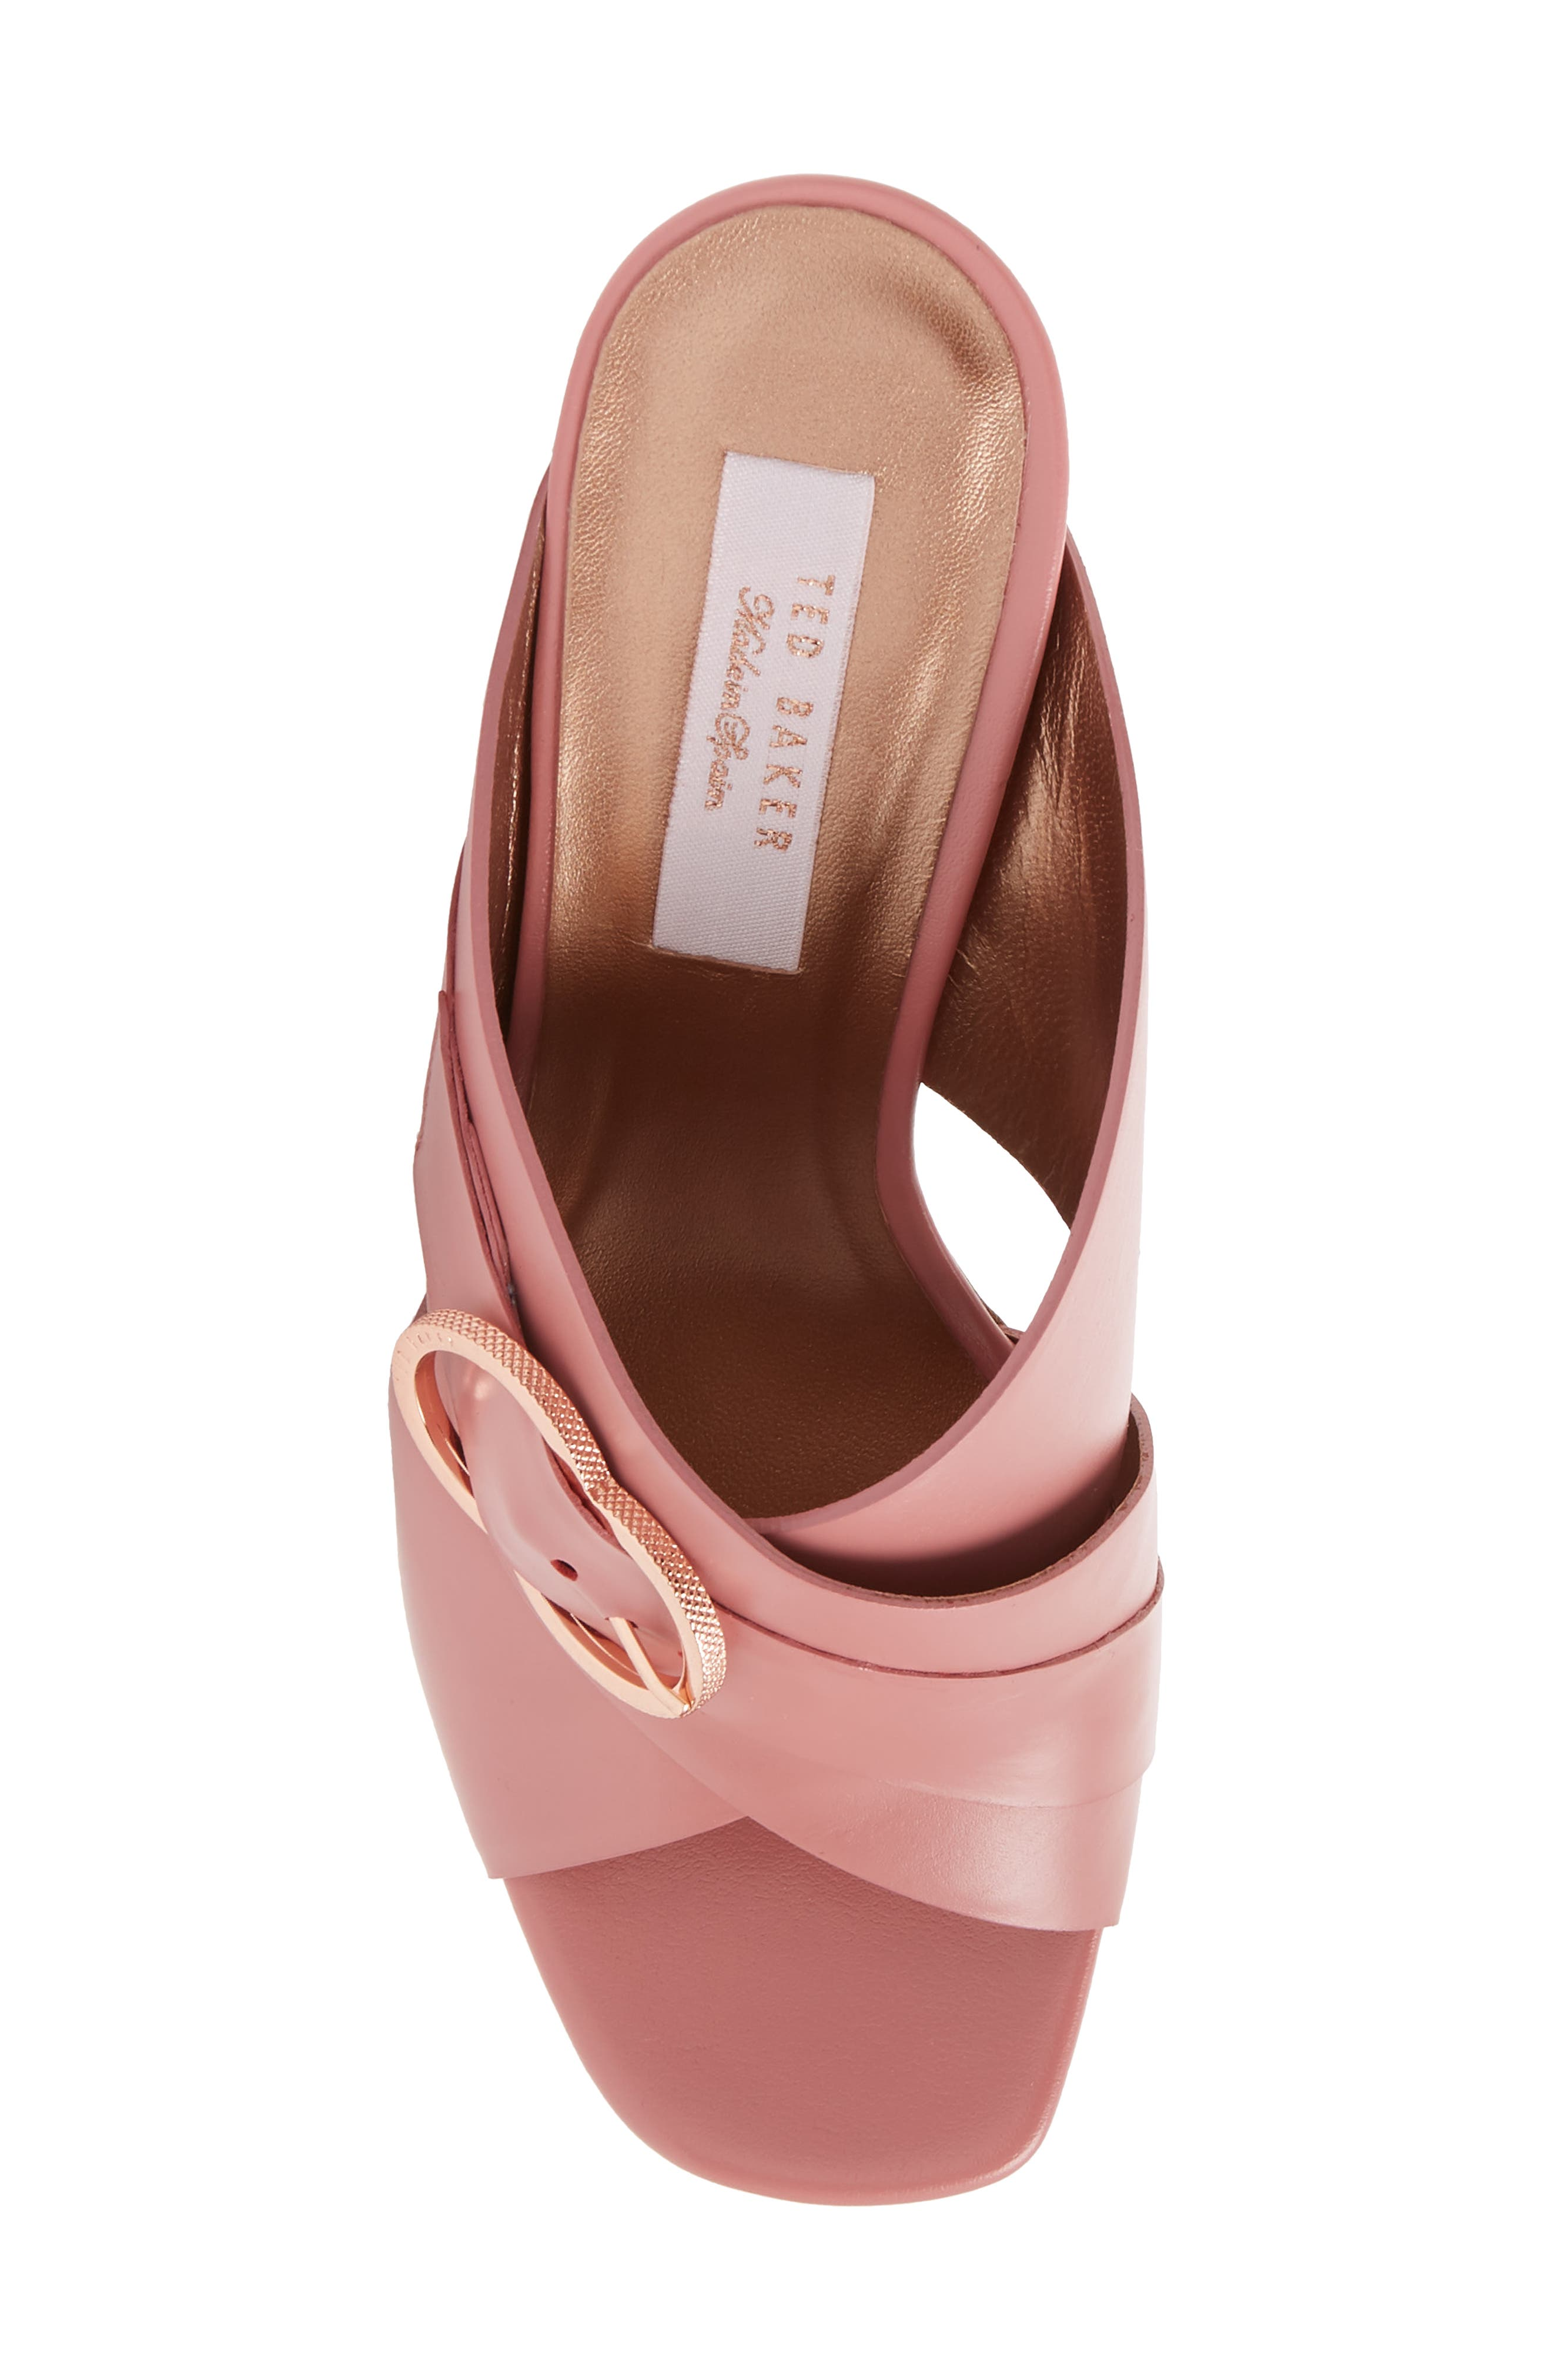 Malada Slide Sandal,                             Alternate thumbnail 5, color,                             Pink Leather